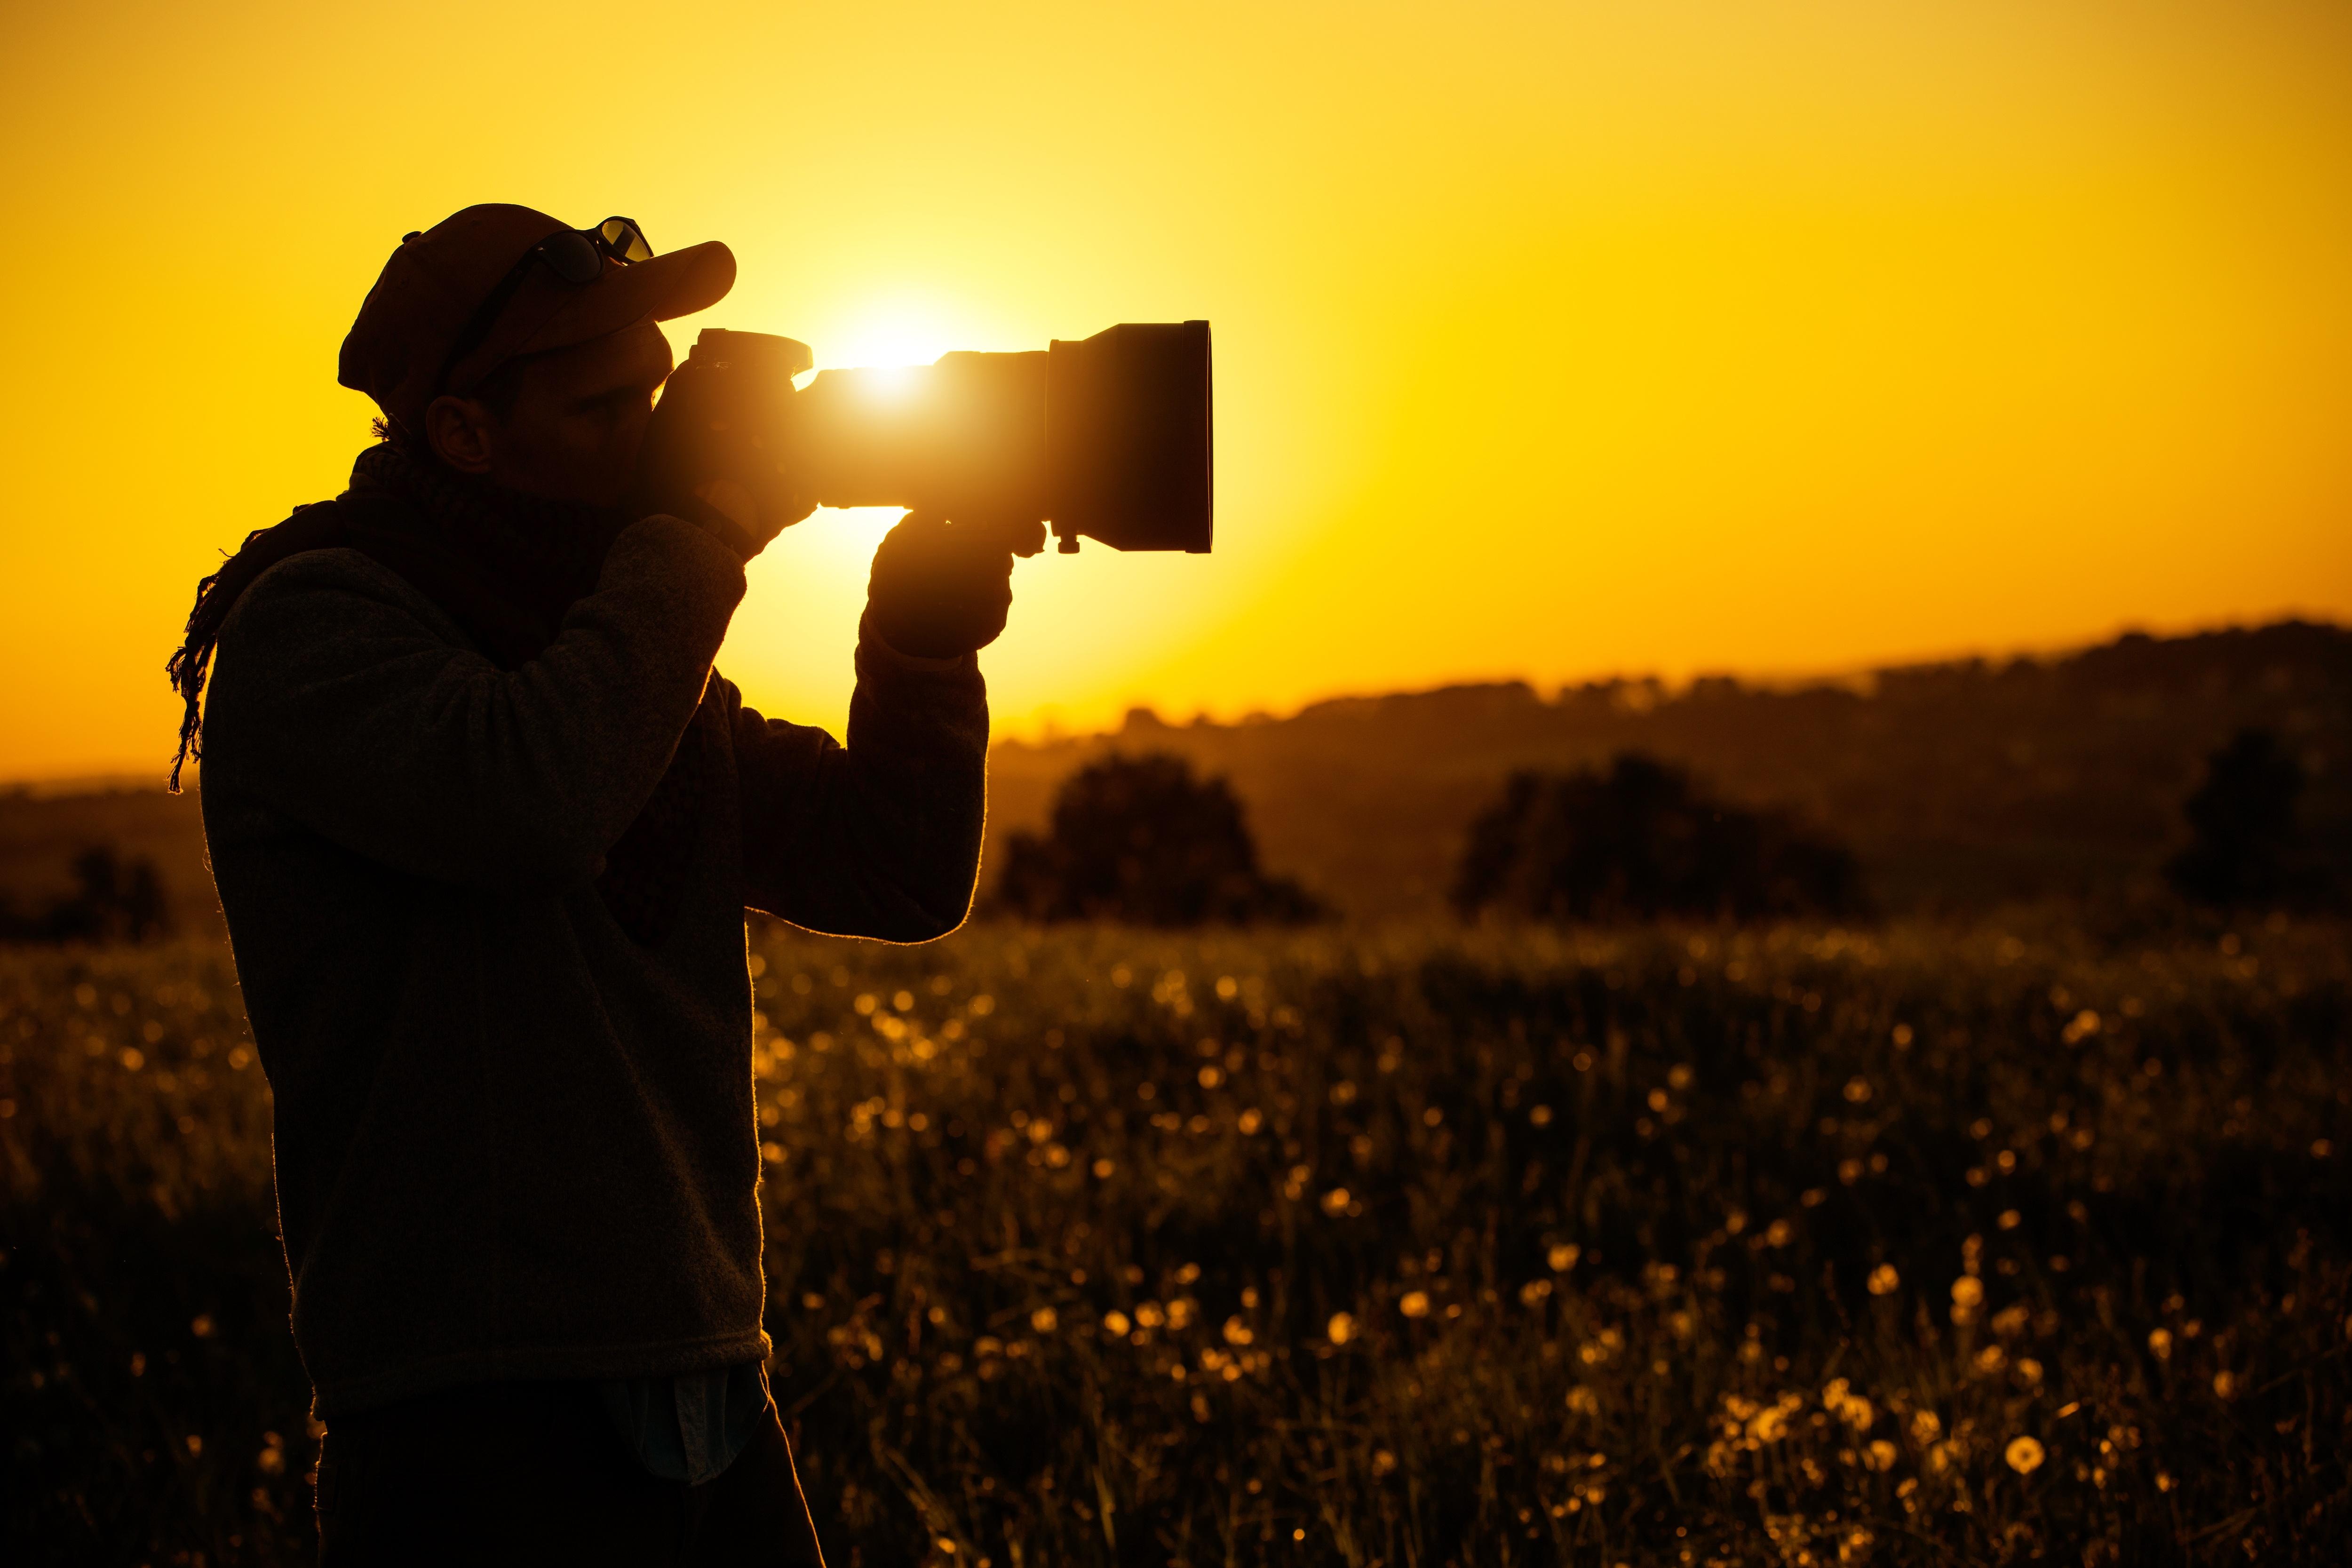 passionate-outdoor-photographer-NCXW6R5